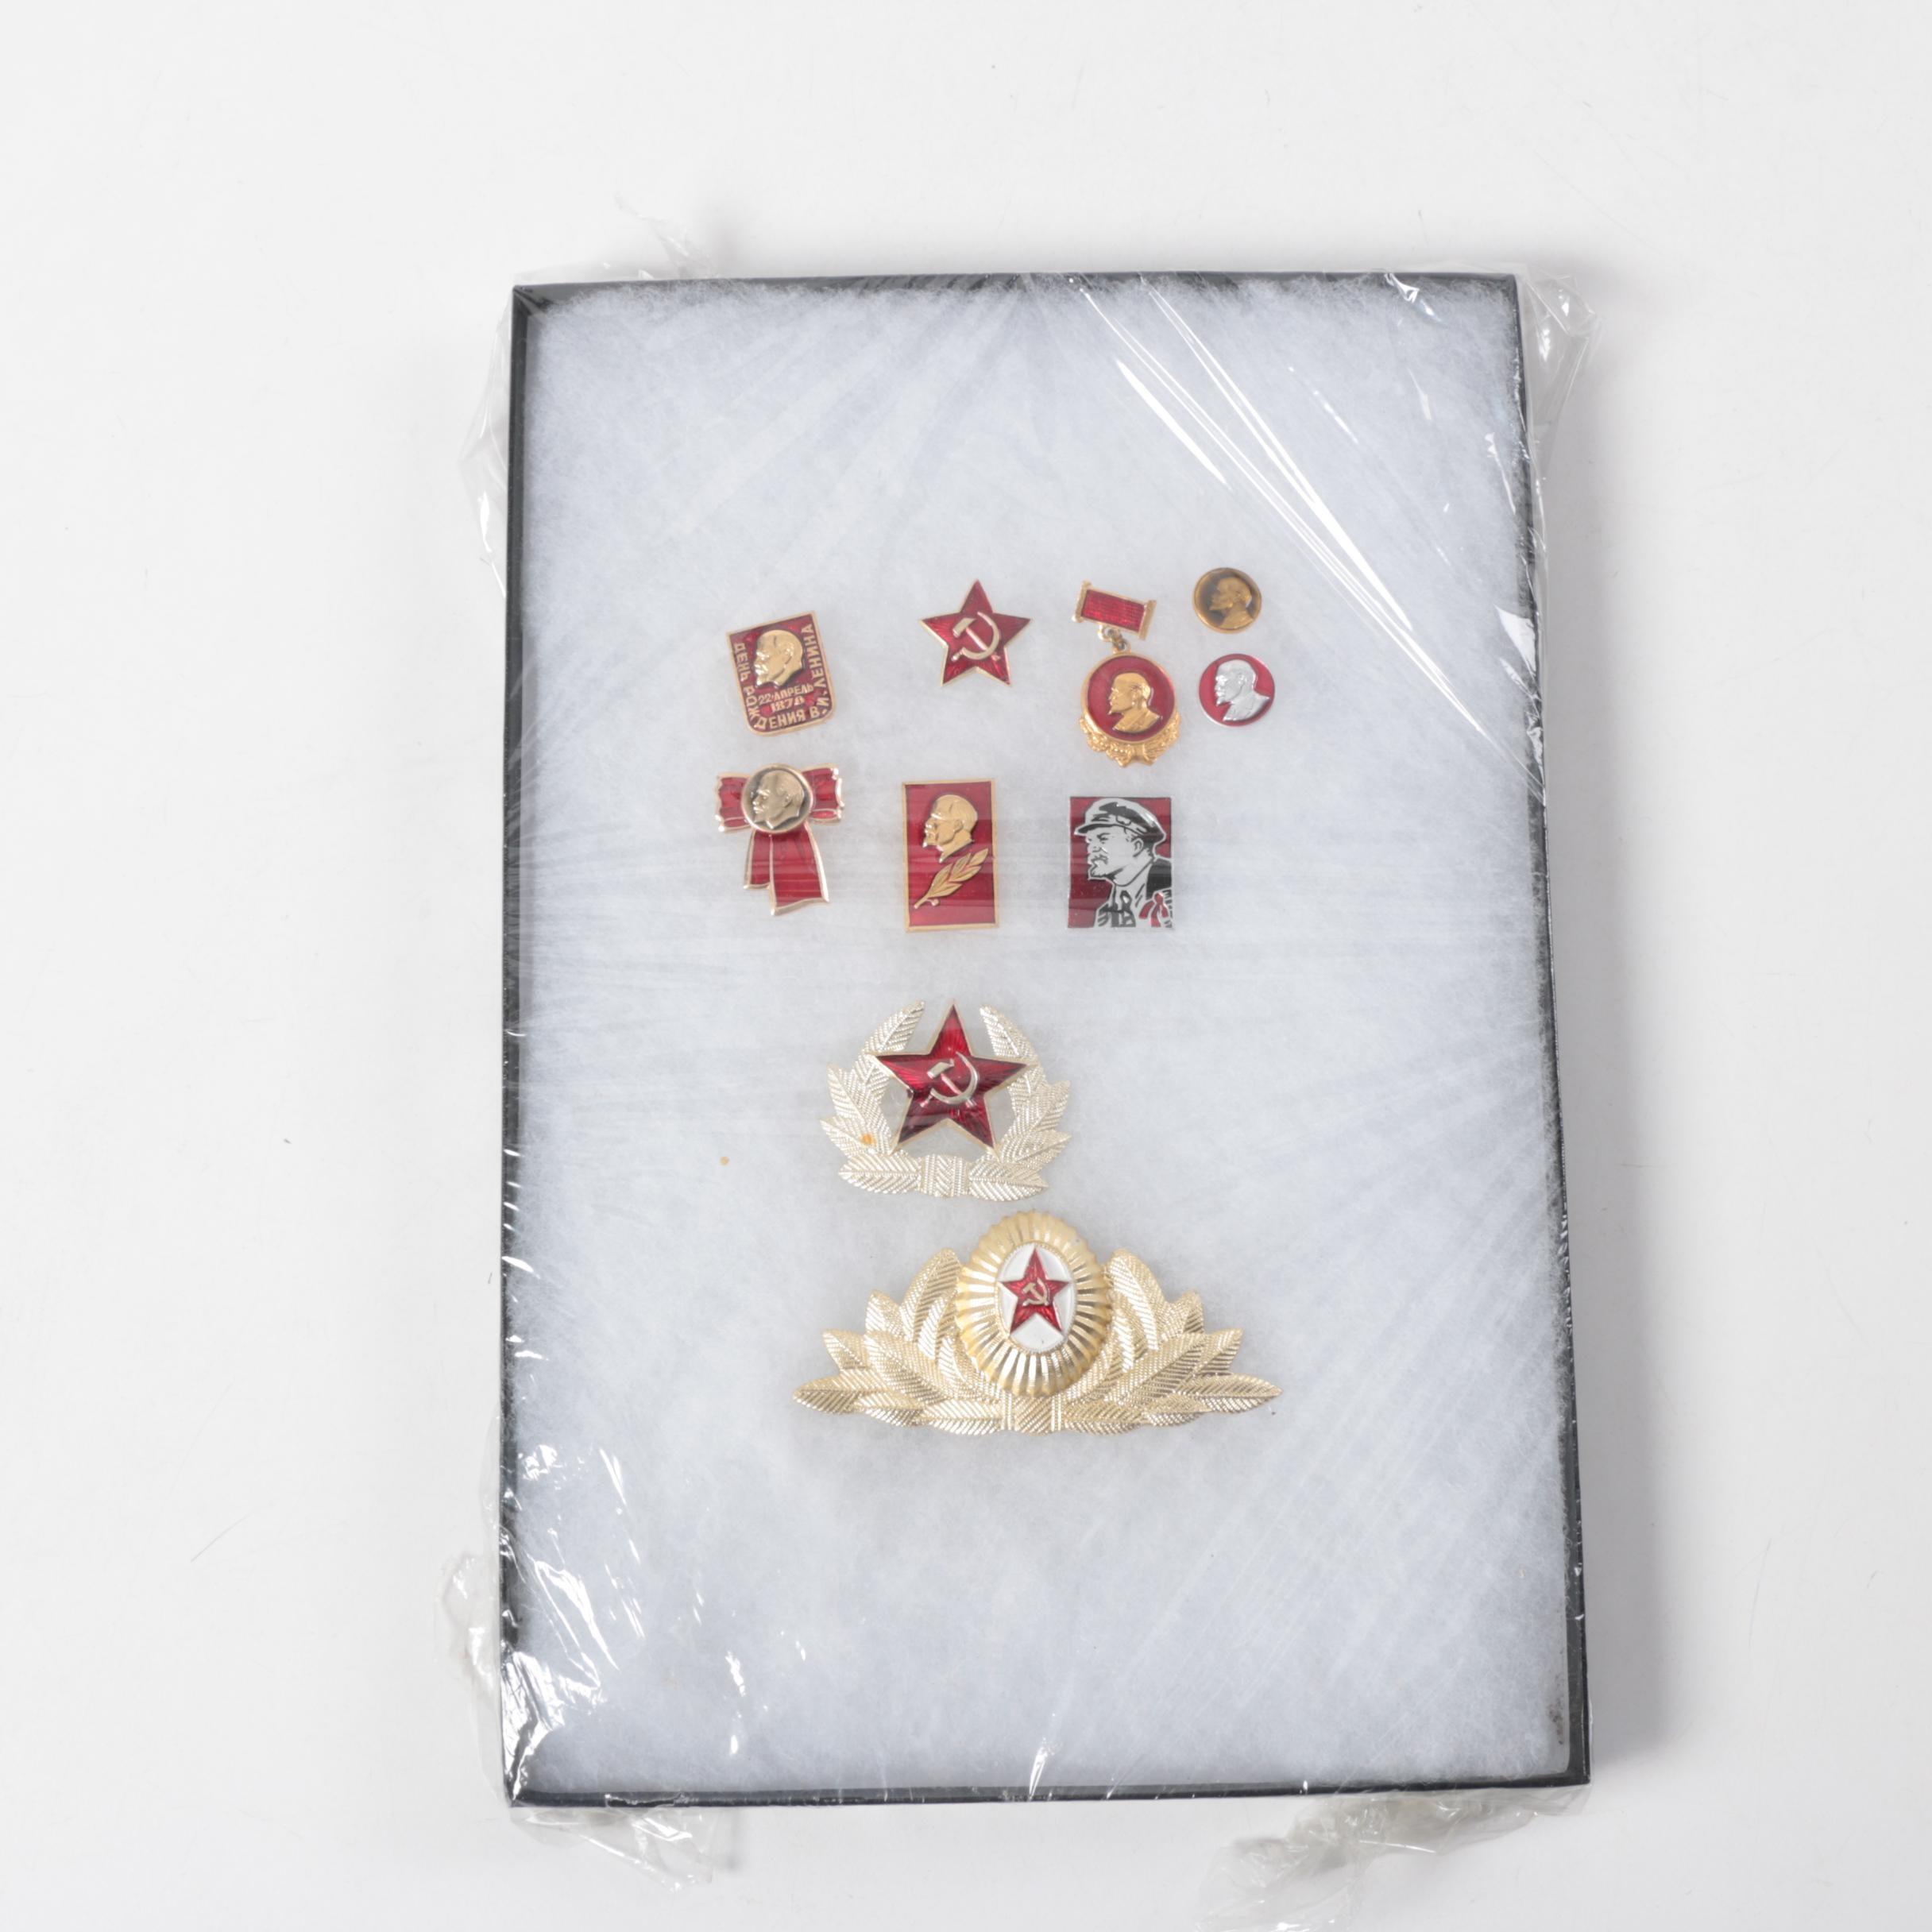 Soviet Pinbacks, Medals and Emblems